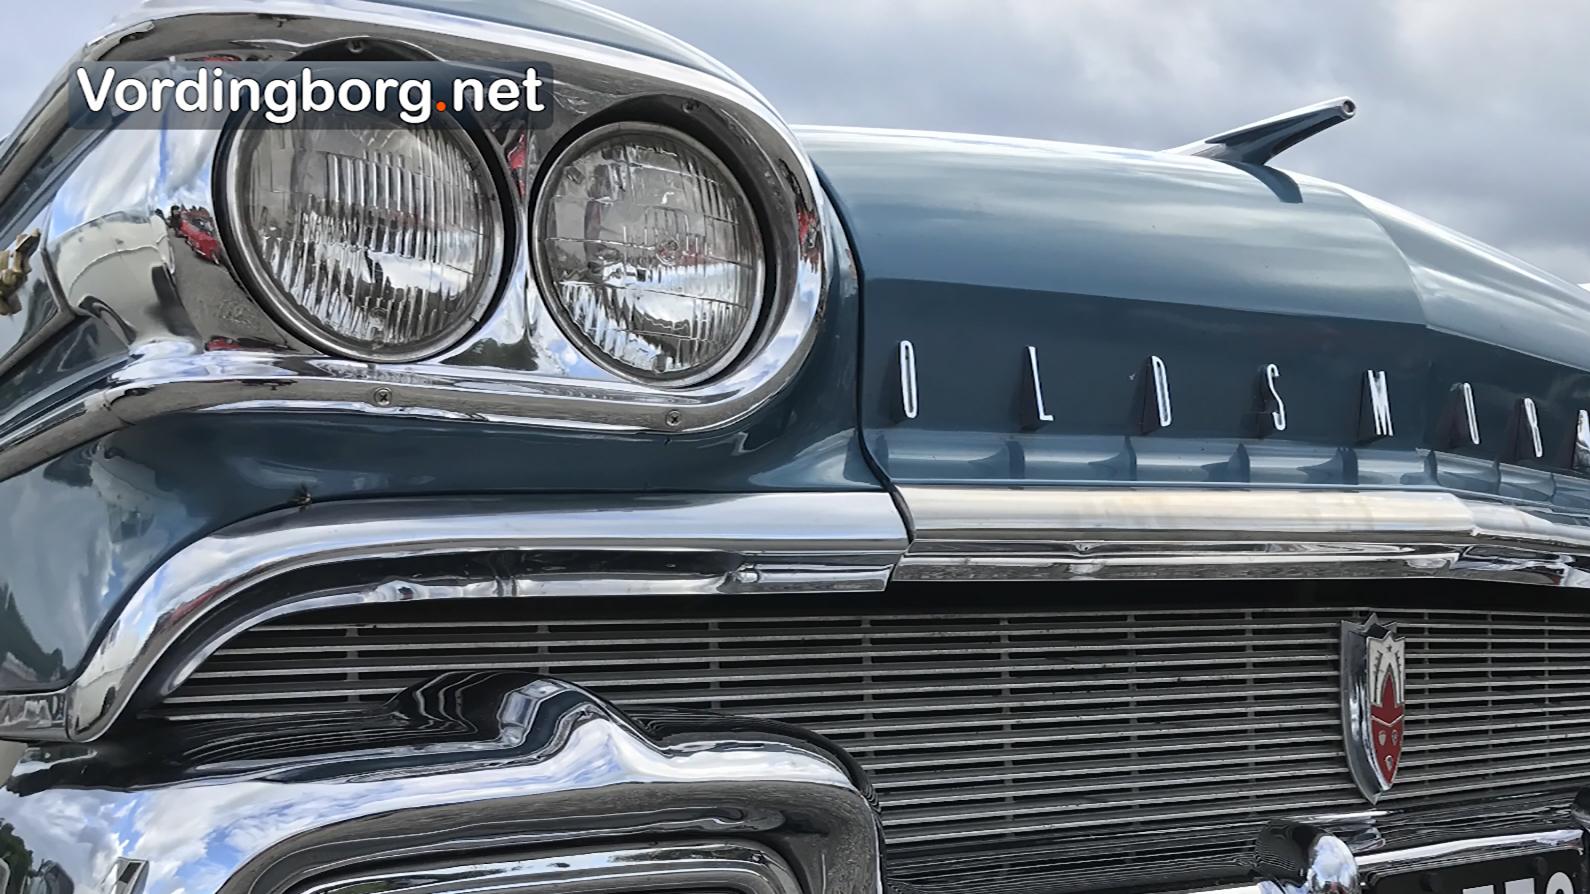 Flotte gamle biler på Nordhavnen i Vordingborg [Video]